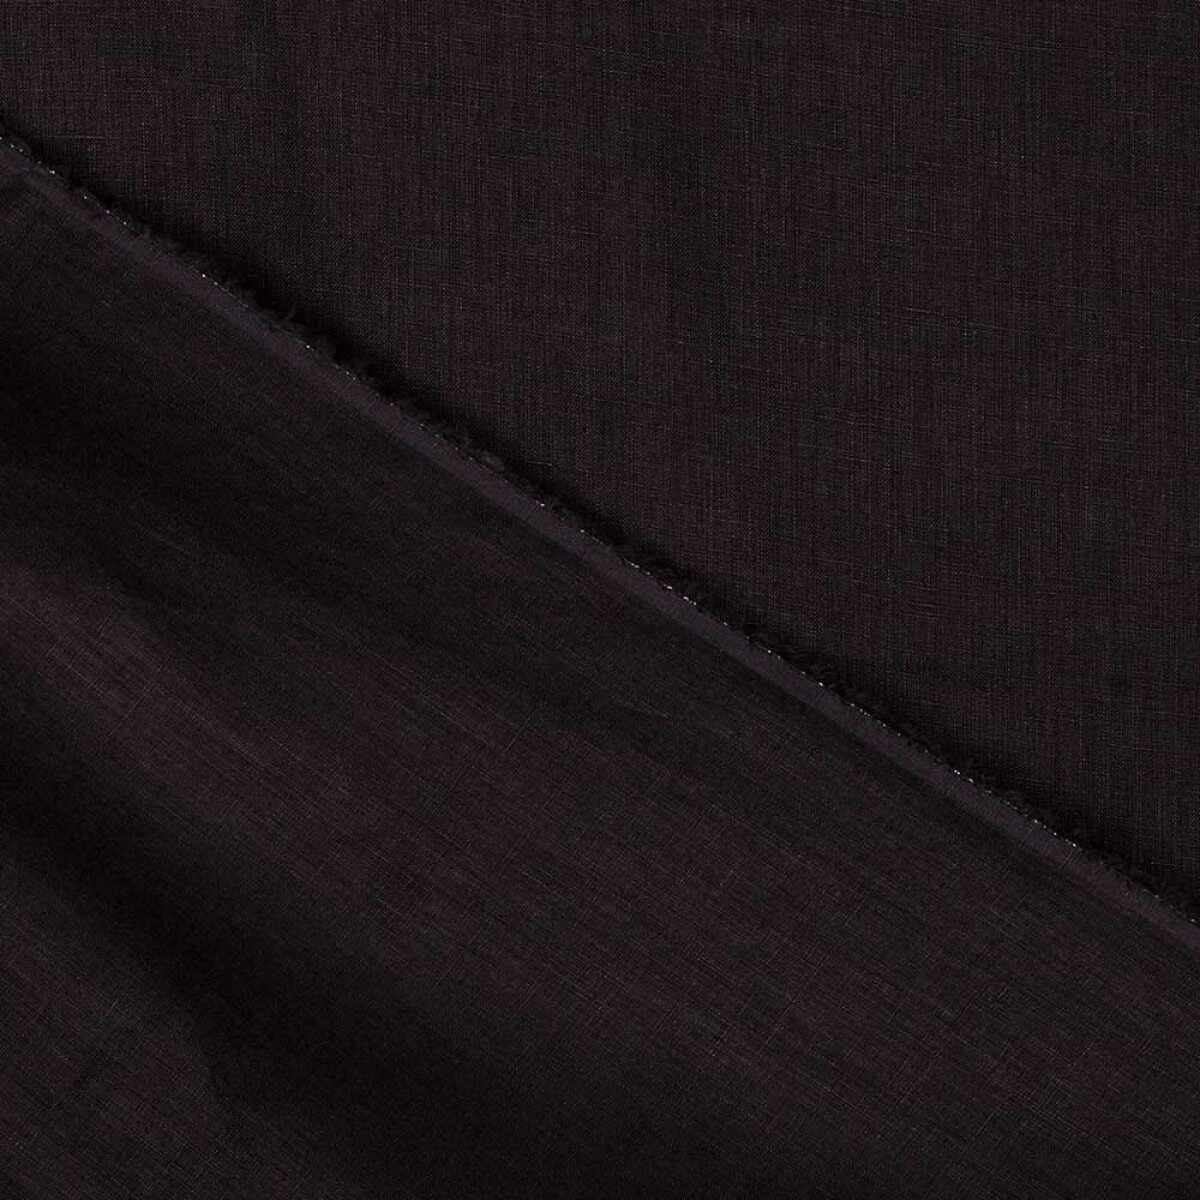 Tissu lin lavé uni 100% biologique - Noir - Mercerie Caréfil b3f5014a4da7